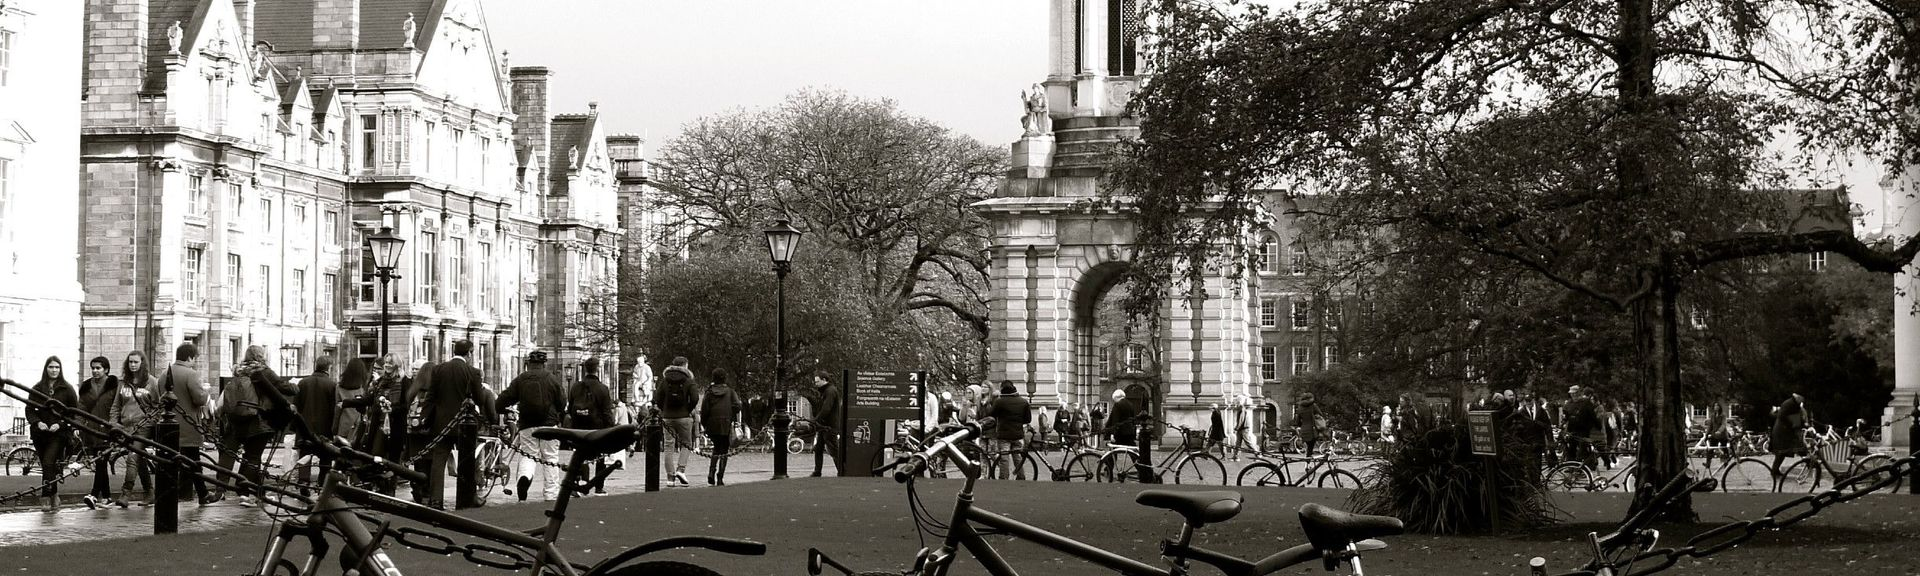 Trinity College, Dublin, Dublin und Umgebung, Irland